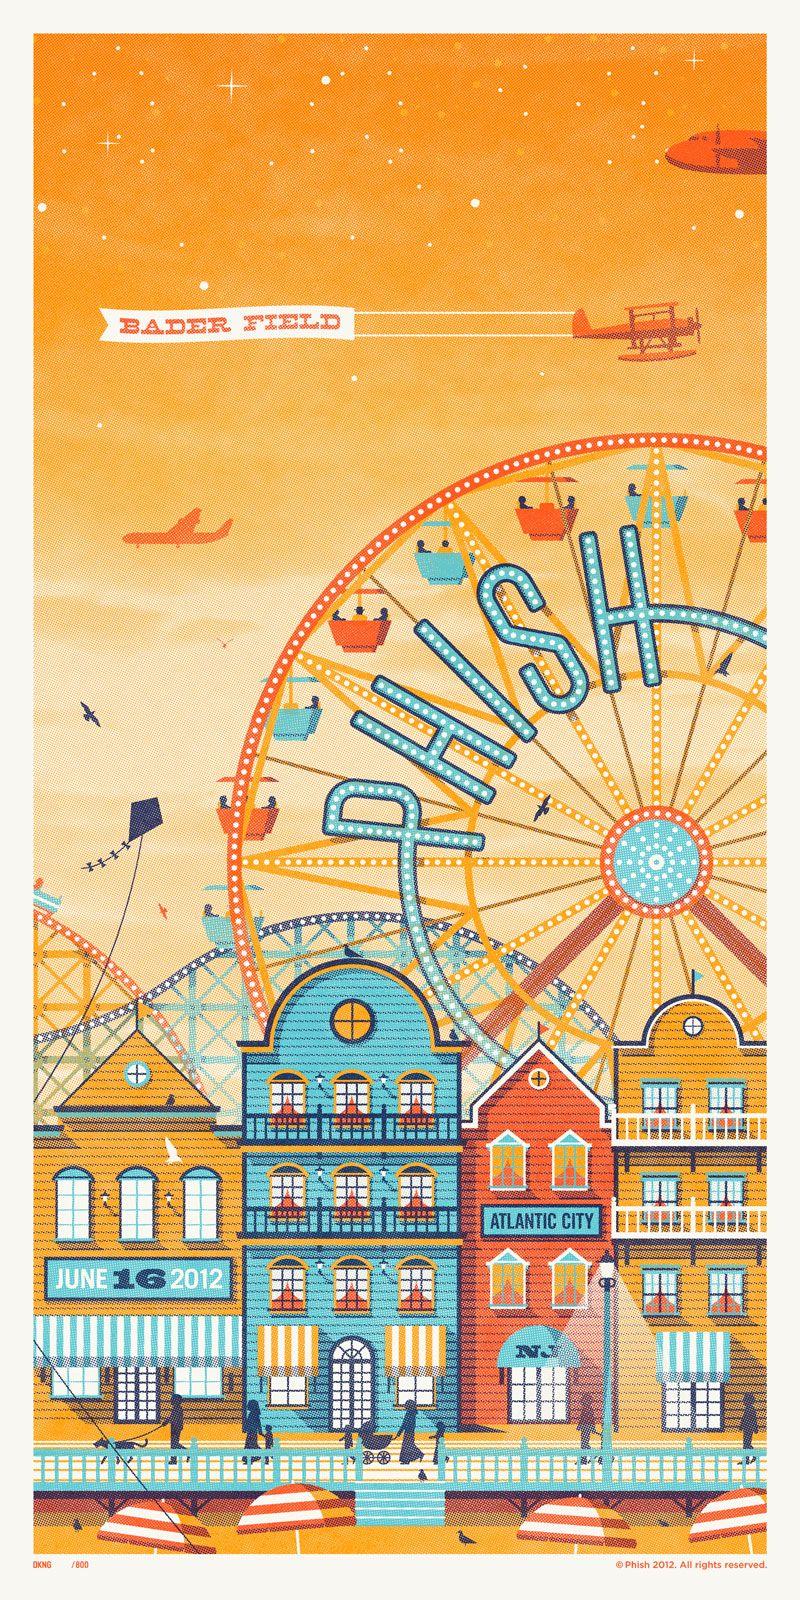 Phish // Atlantic City, NJ Poster Series by DKNG Studios